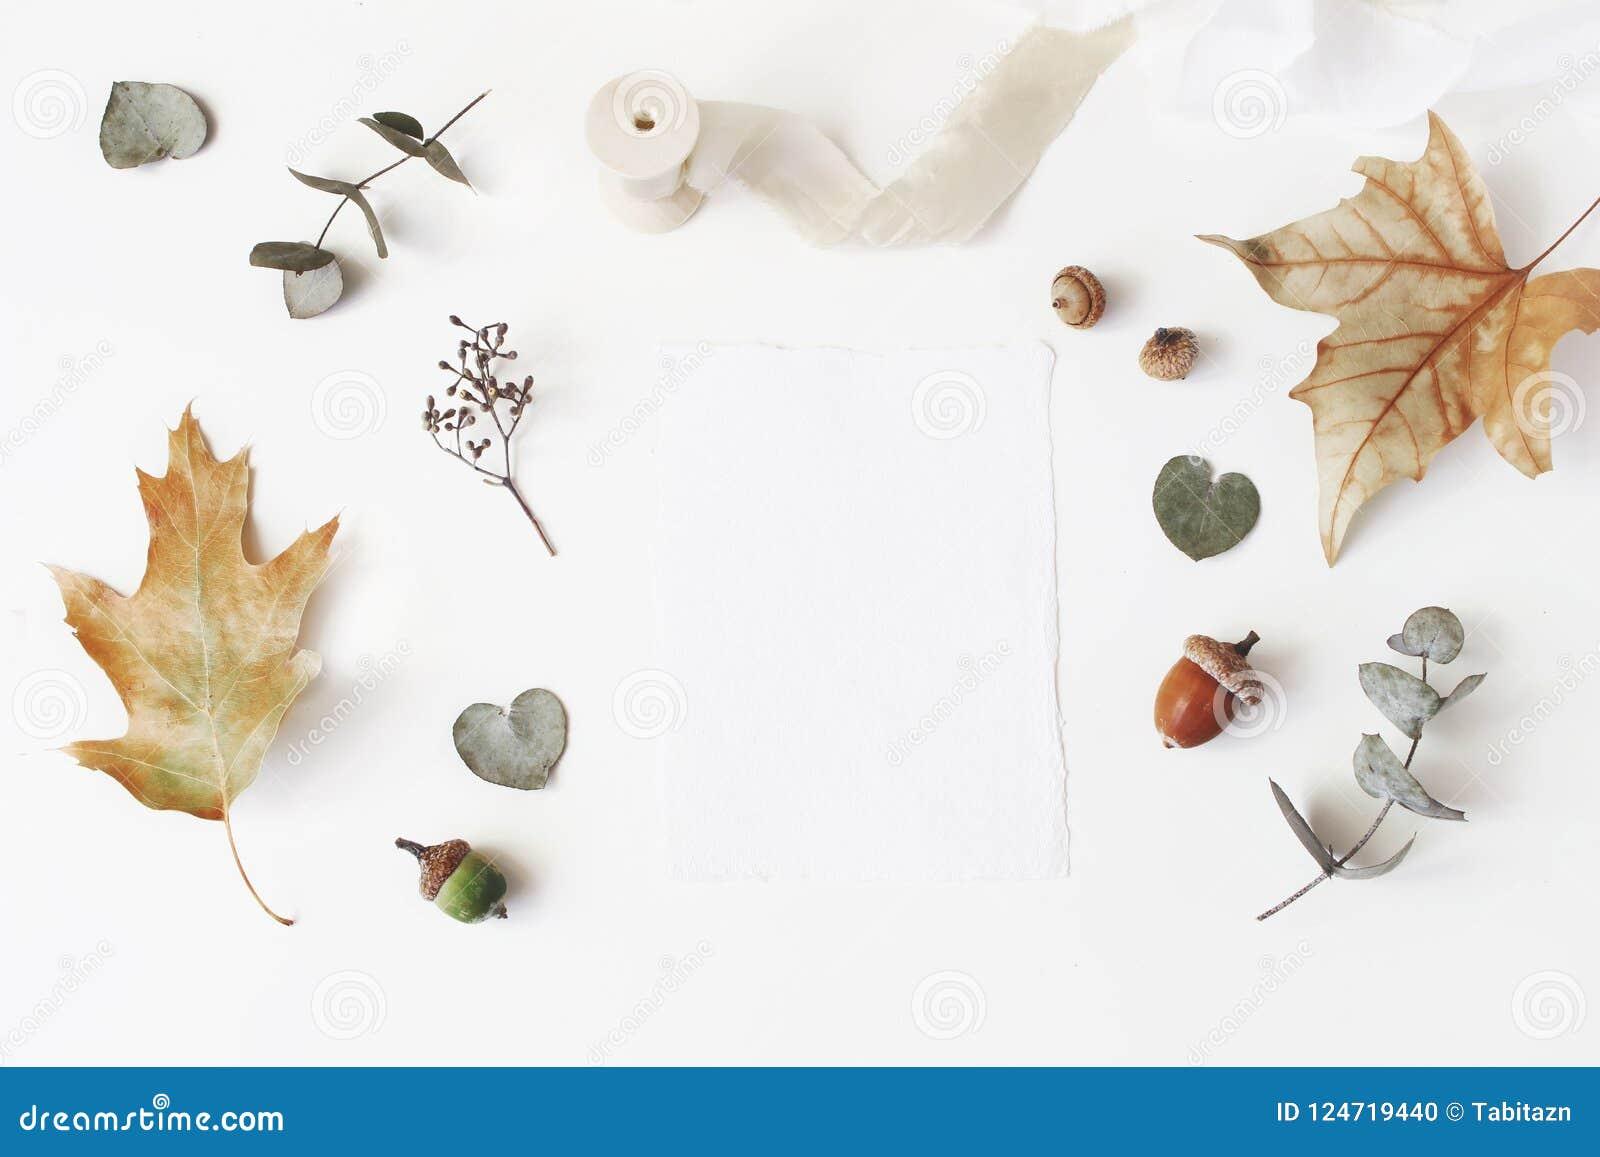 Autumn styled stock photo. Feminine wedding desktop stationery mockup scene with blank greeting card, dry eucalyptus